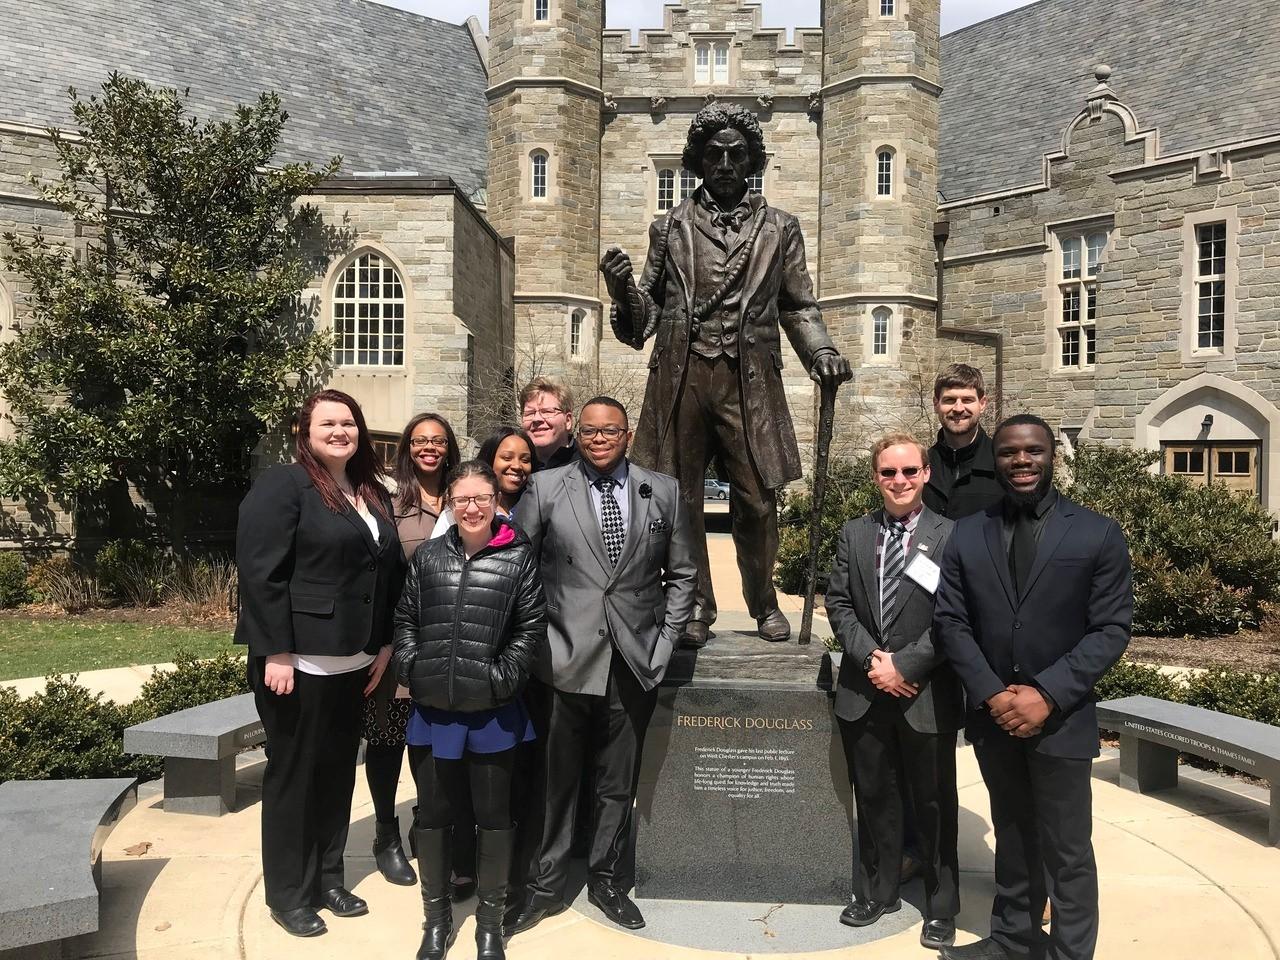 2018 Team Photo with Frederick Douglass Statue